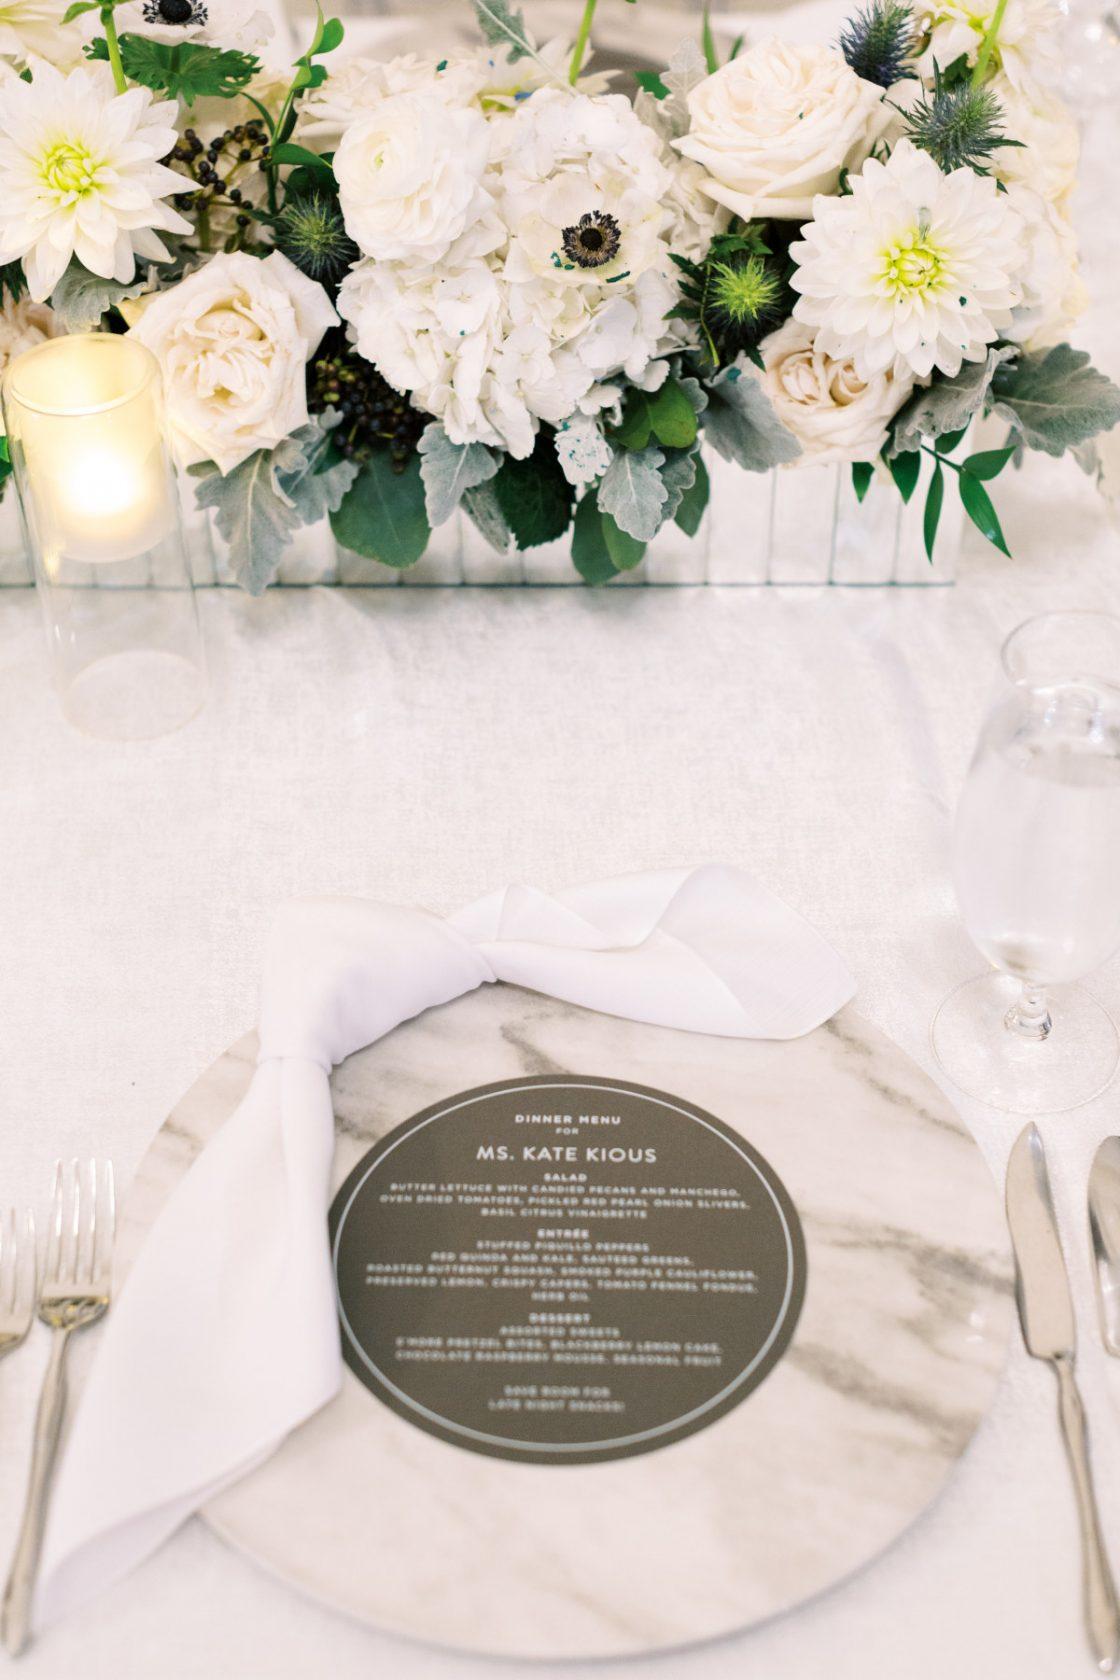 Classic Modern Wedding Place Setting Menu